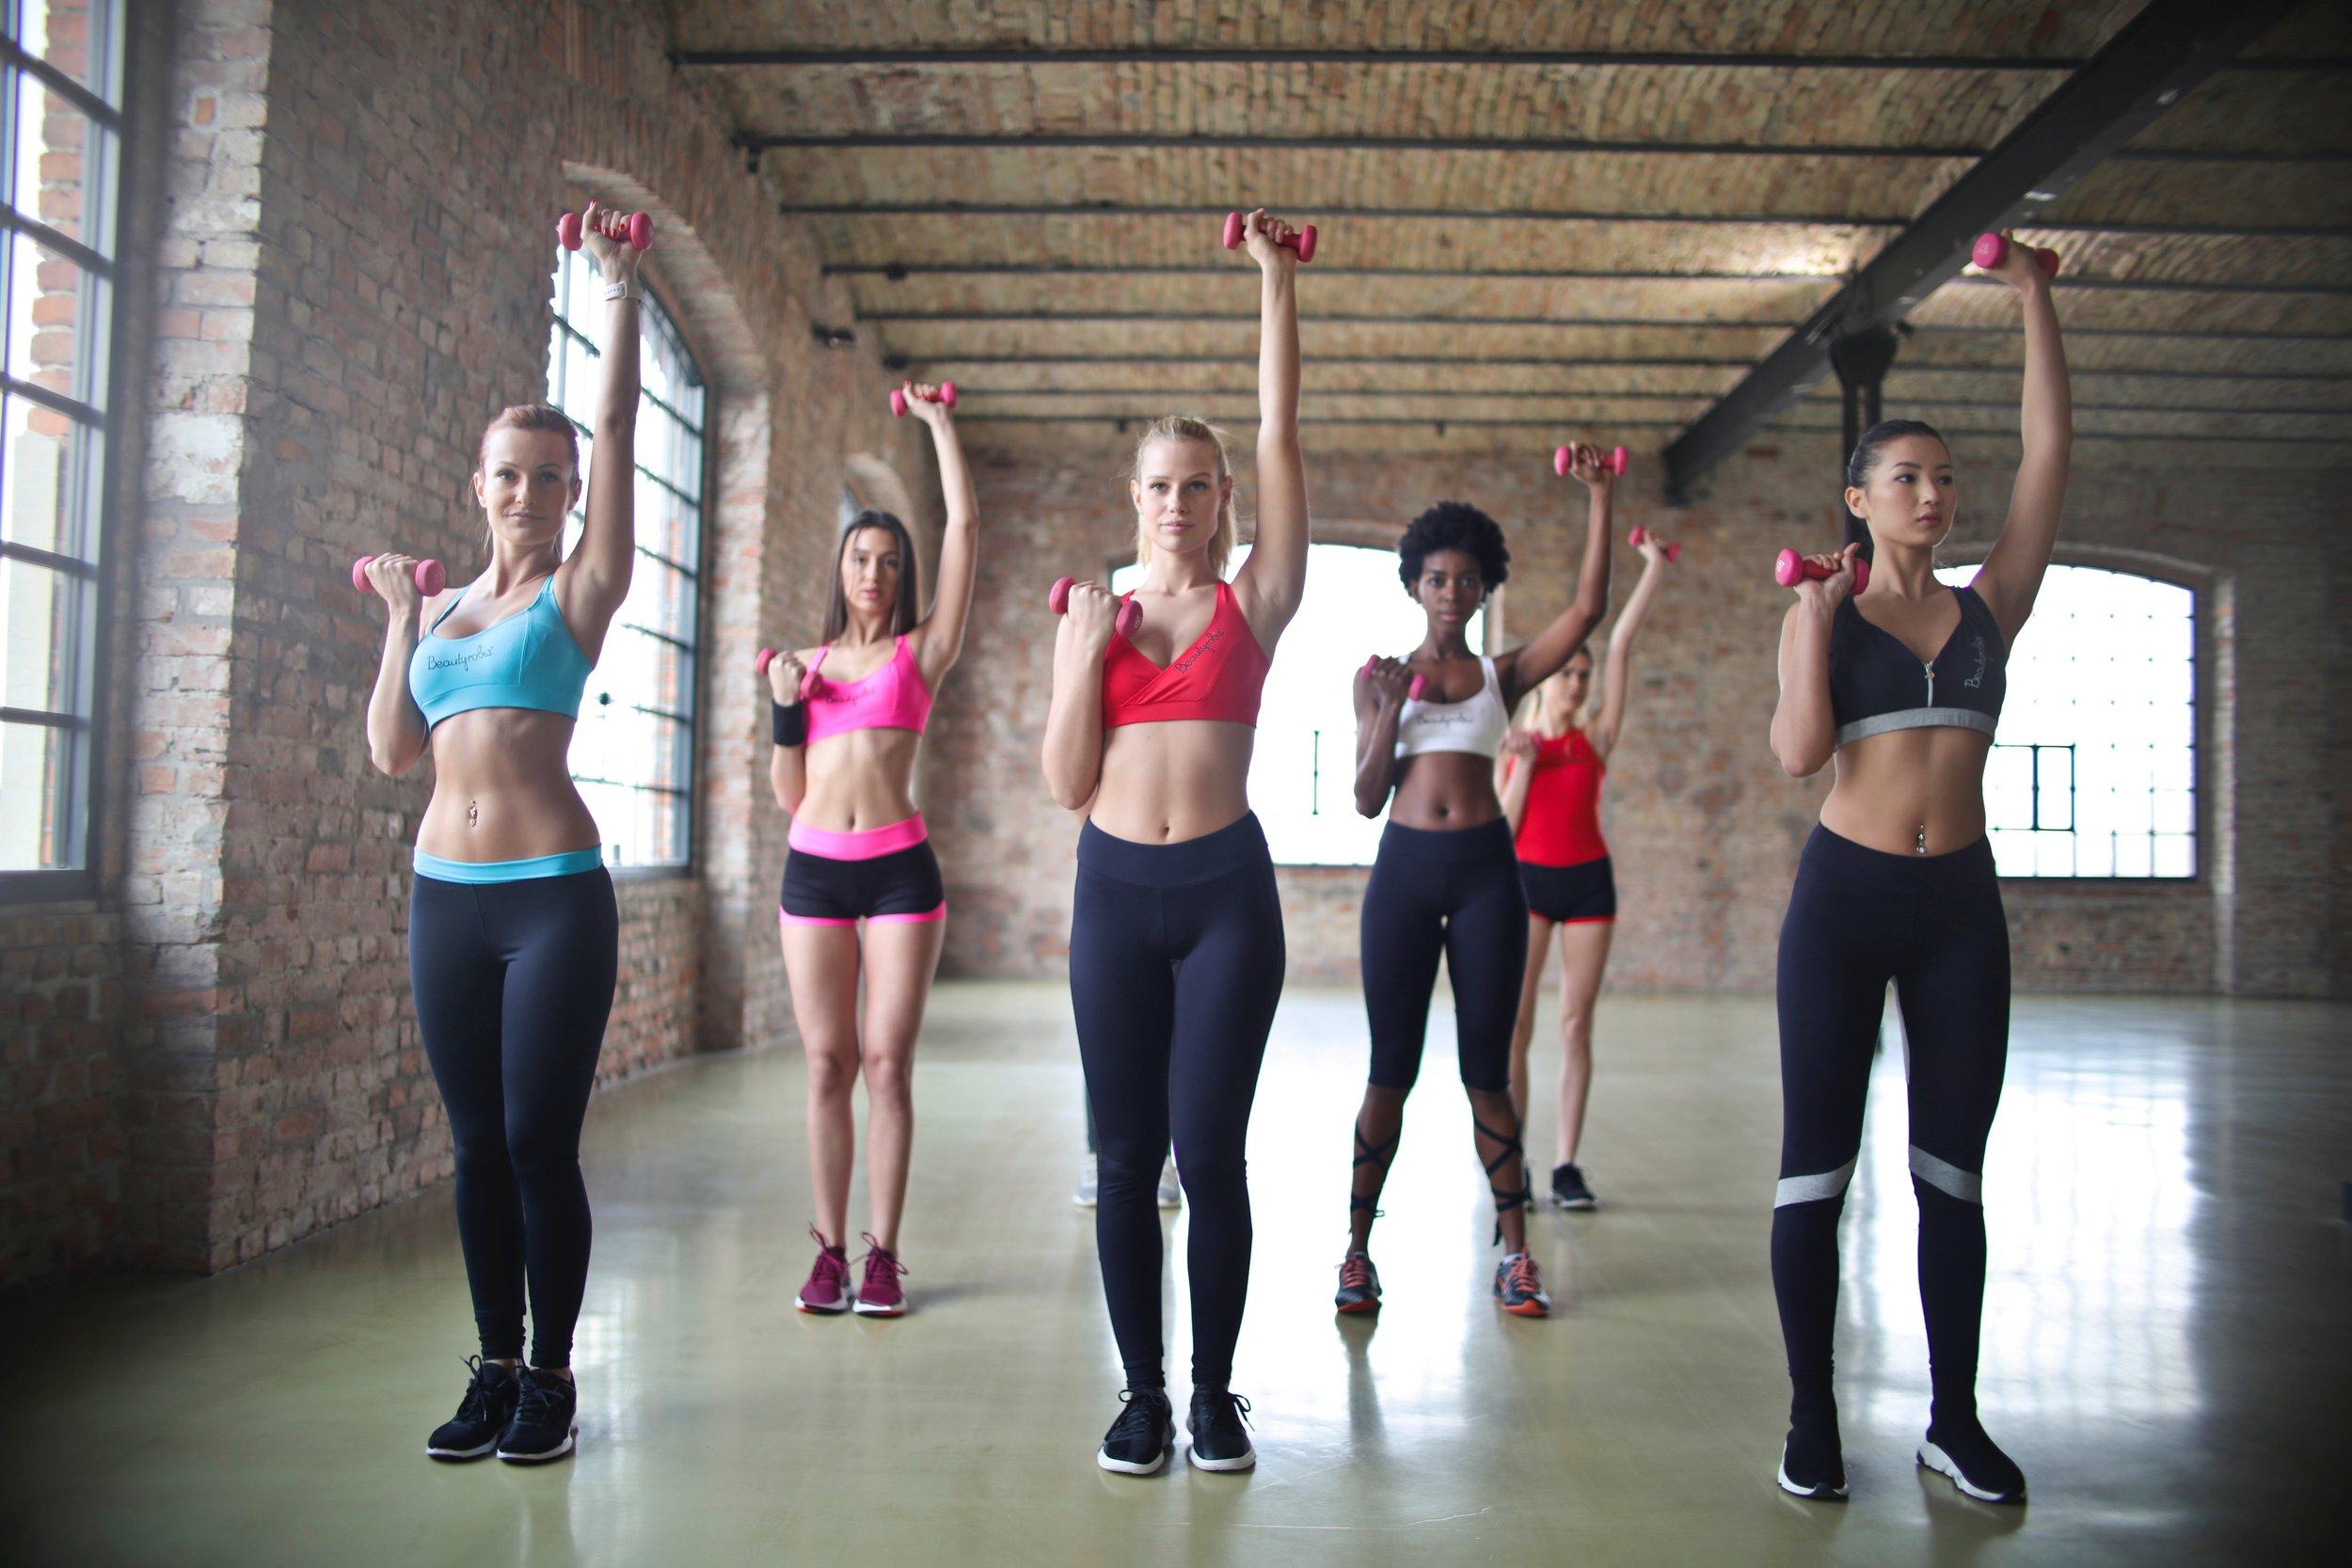 Femmes fit -